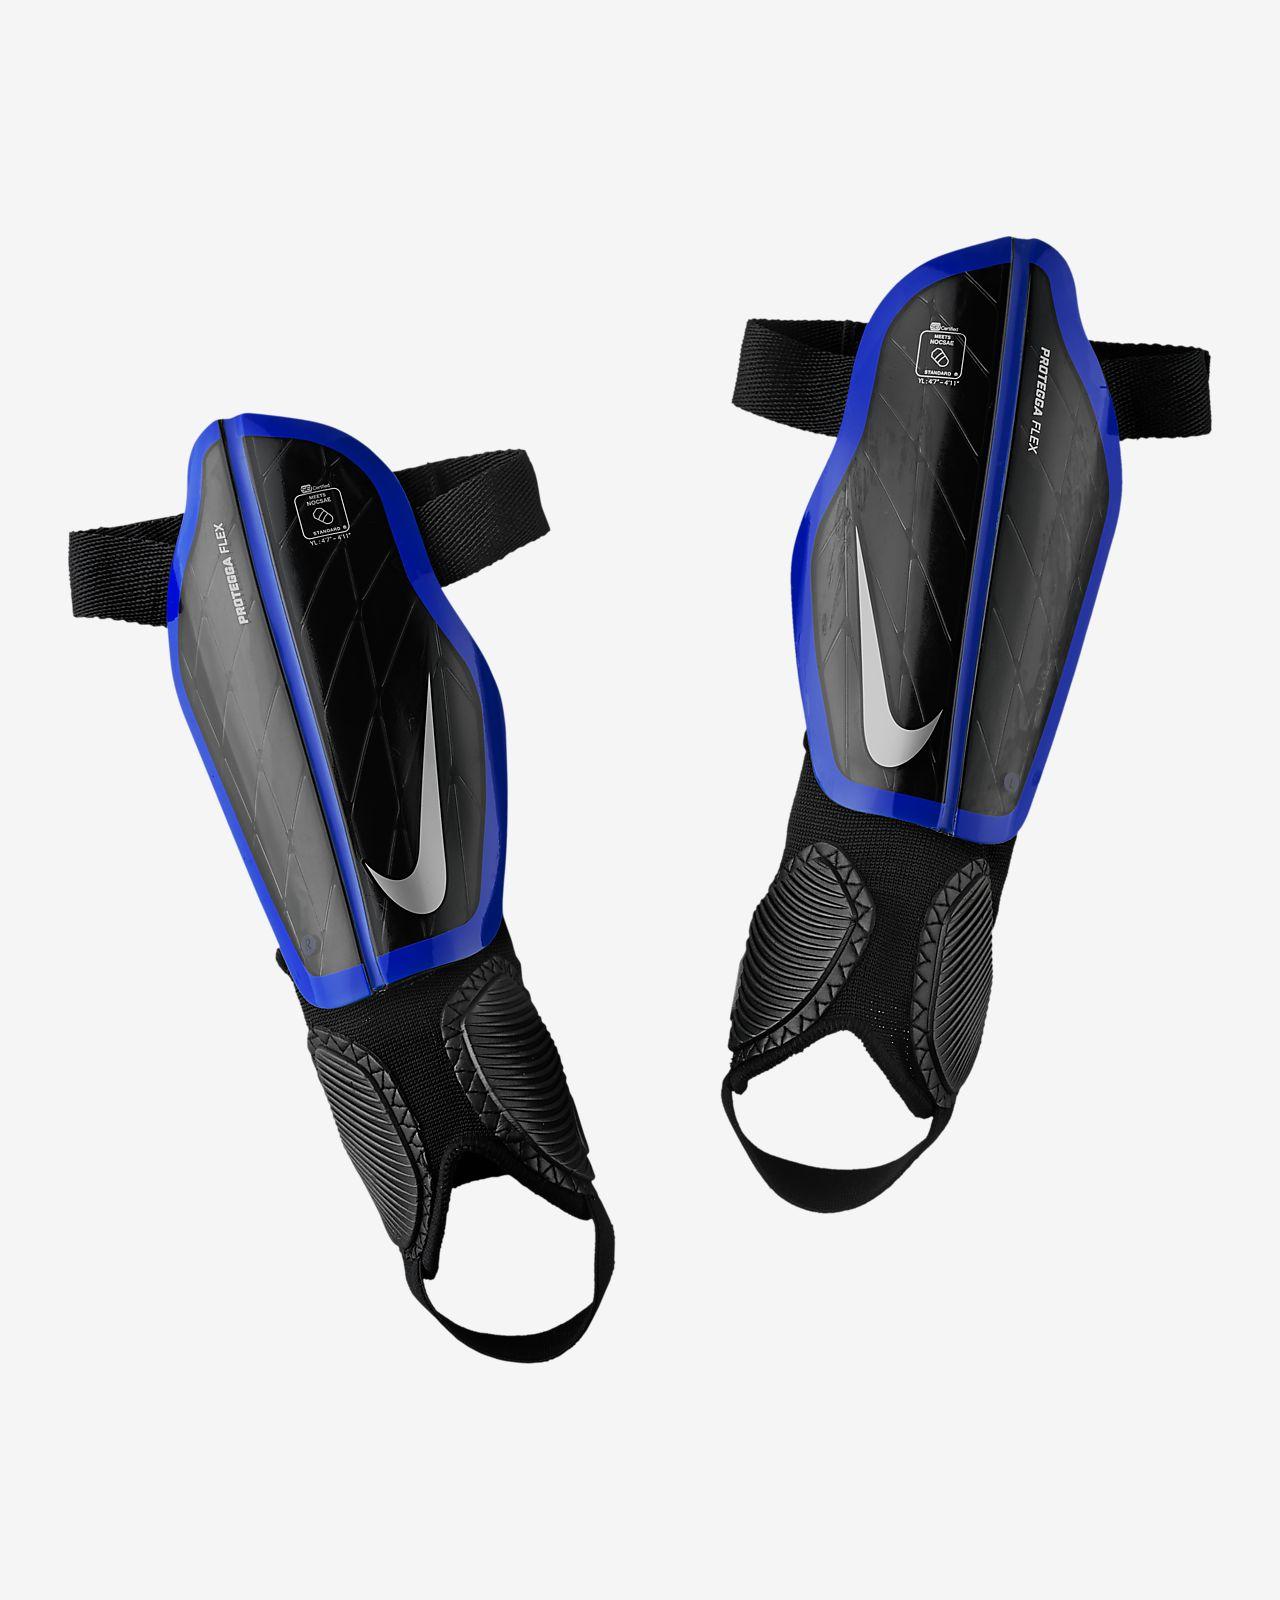 3151594c4935f Nike Protegga Flex Espinilleras de fútbol - Niño a. Nike.com ES